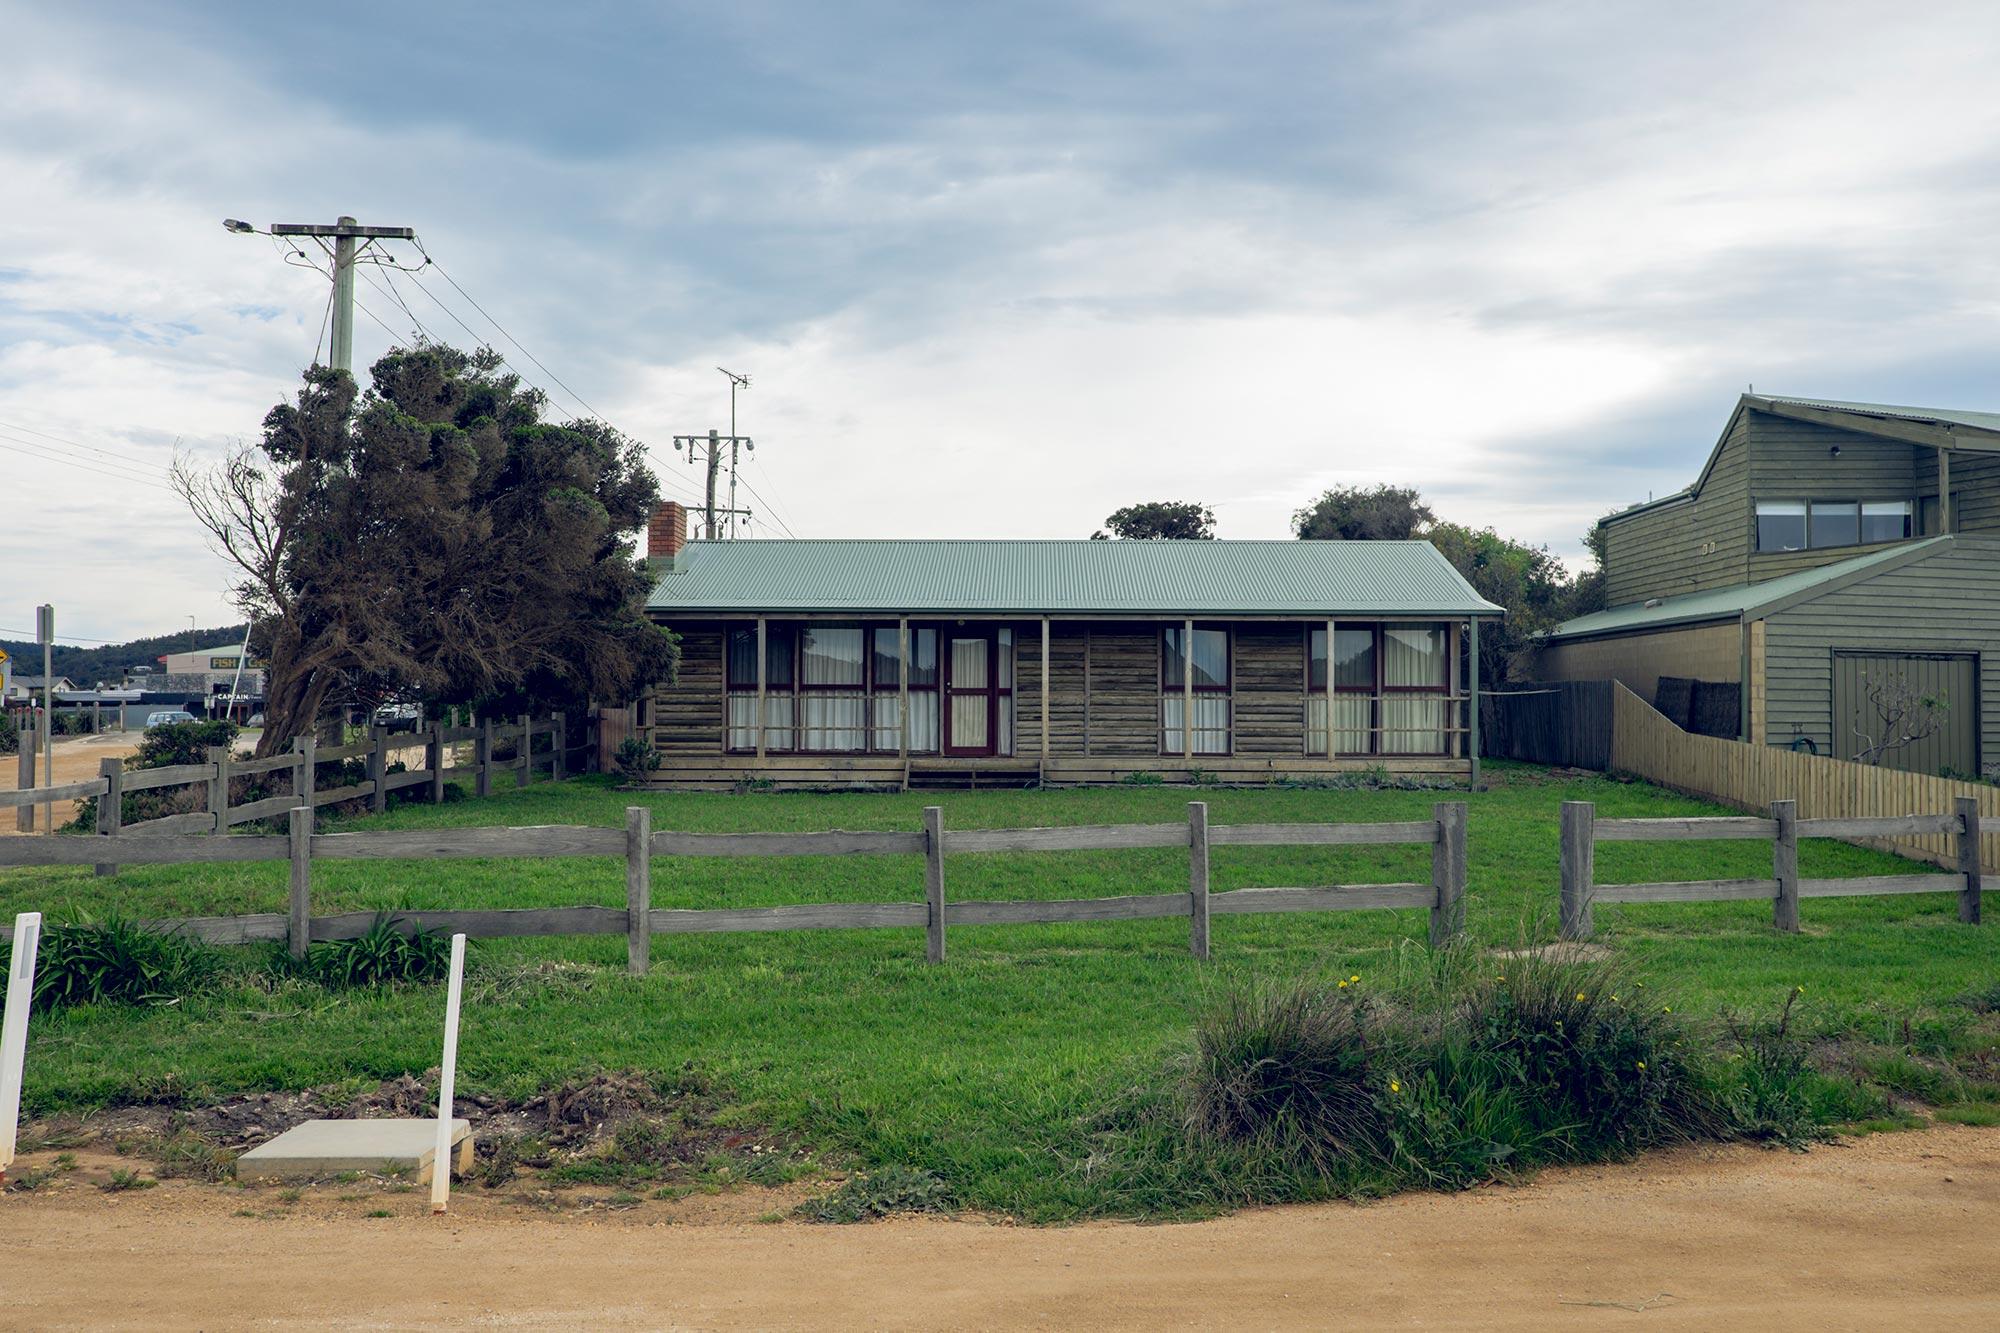 australia-melbourne-great-ocean-road-fairhaven1